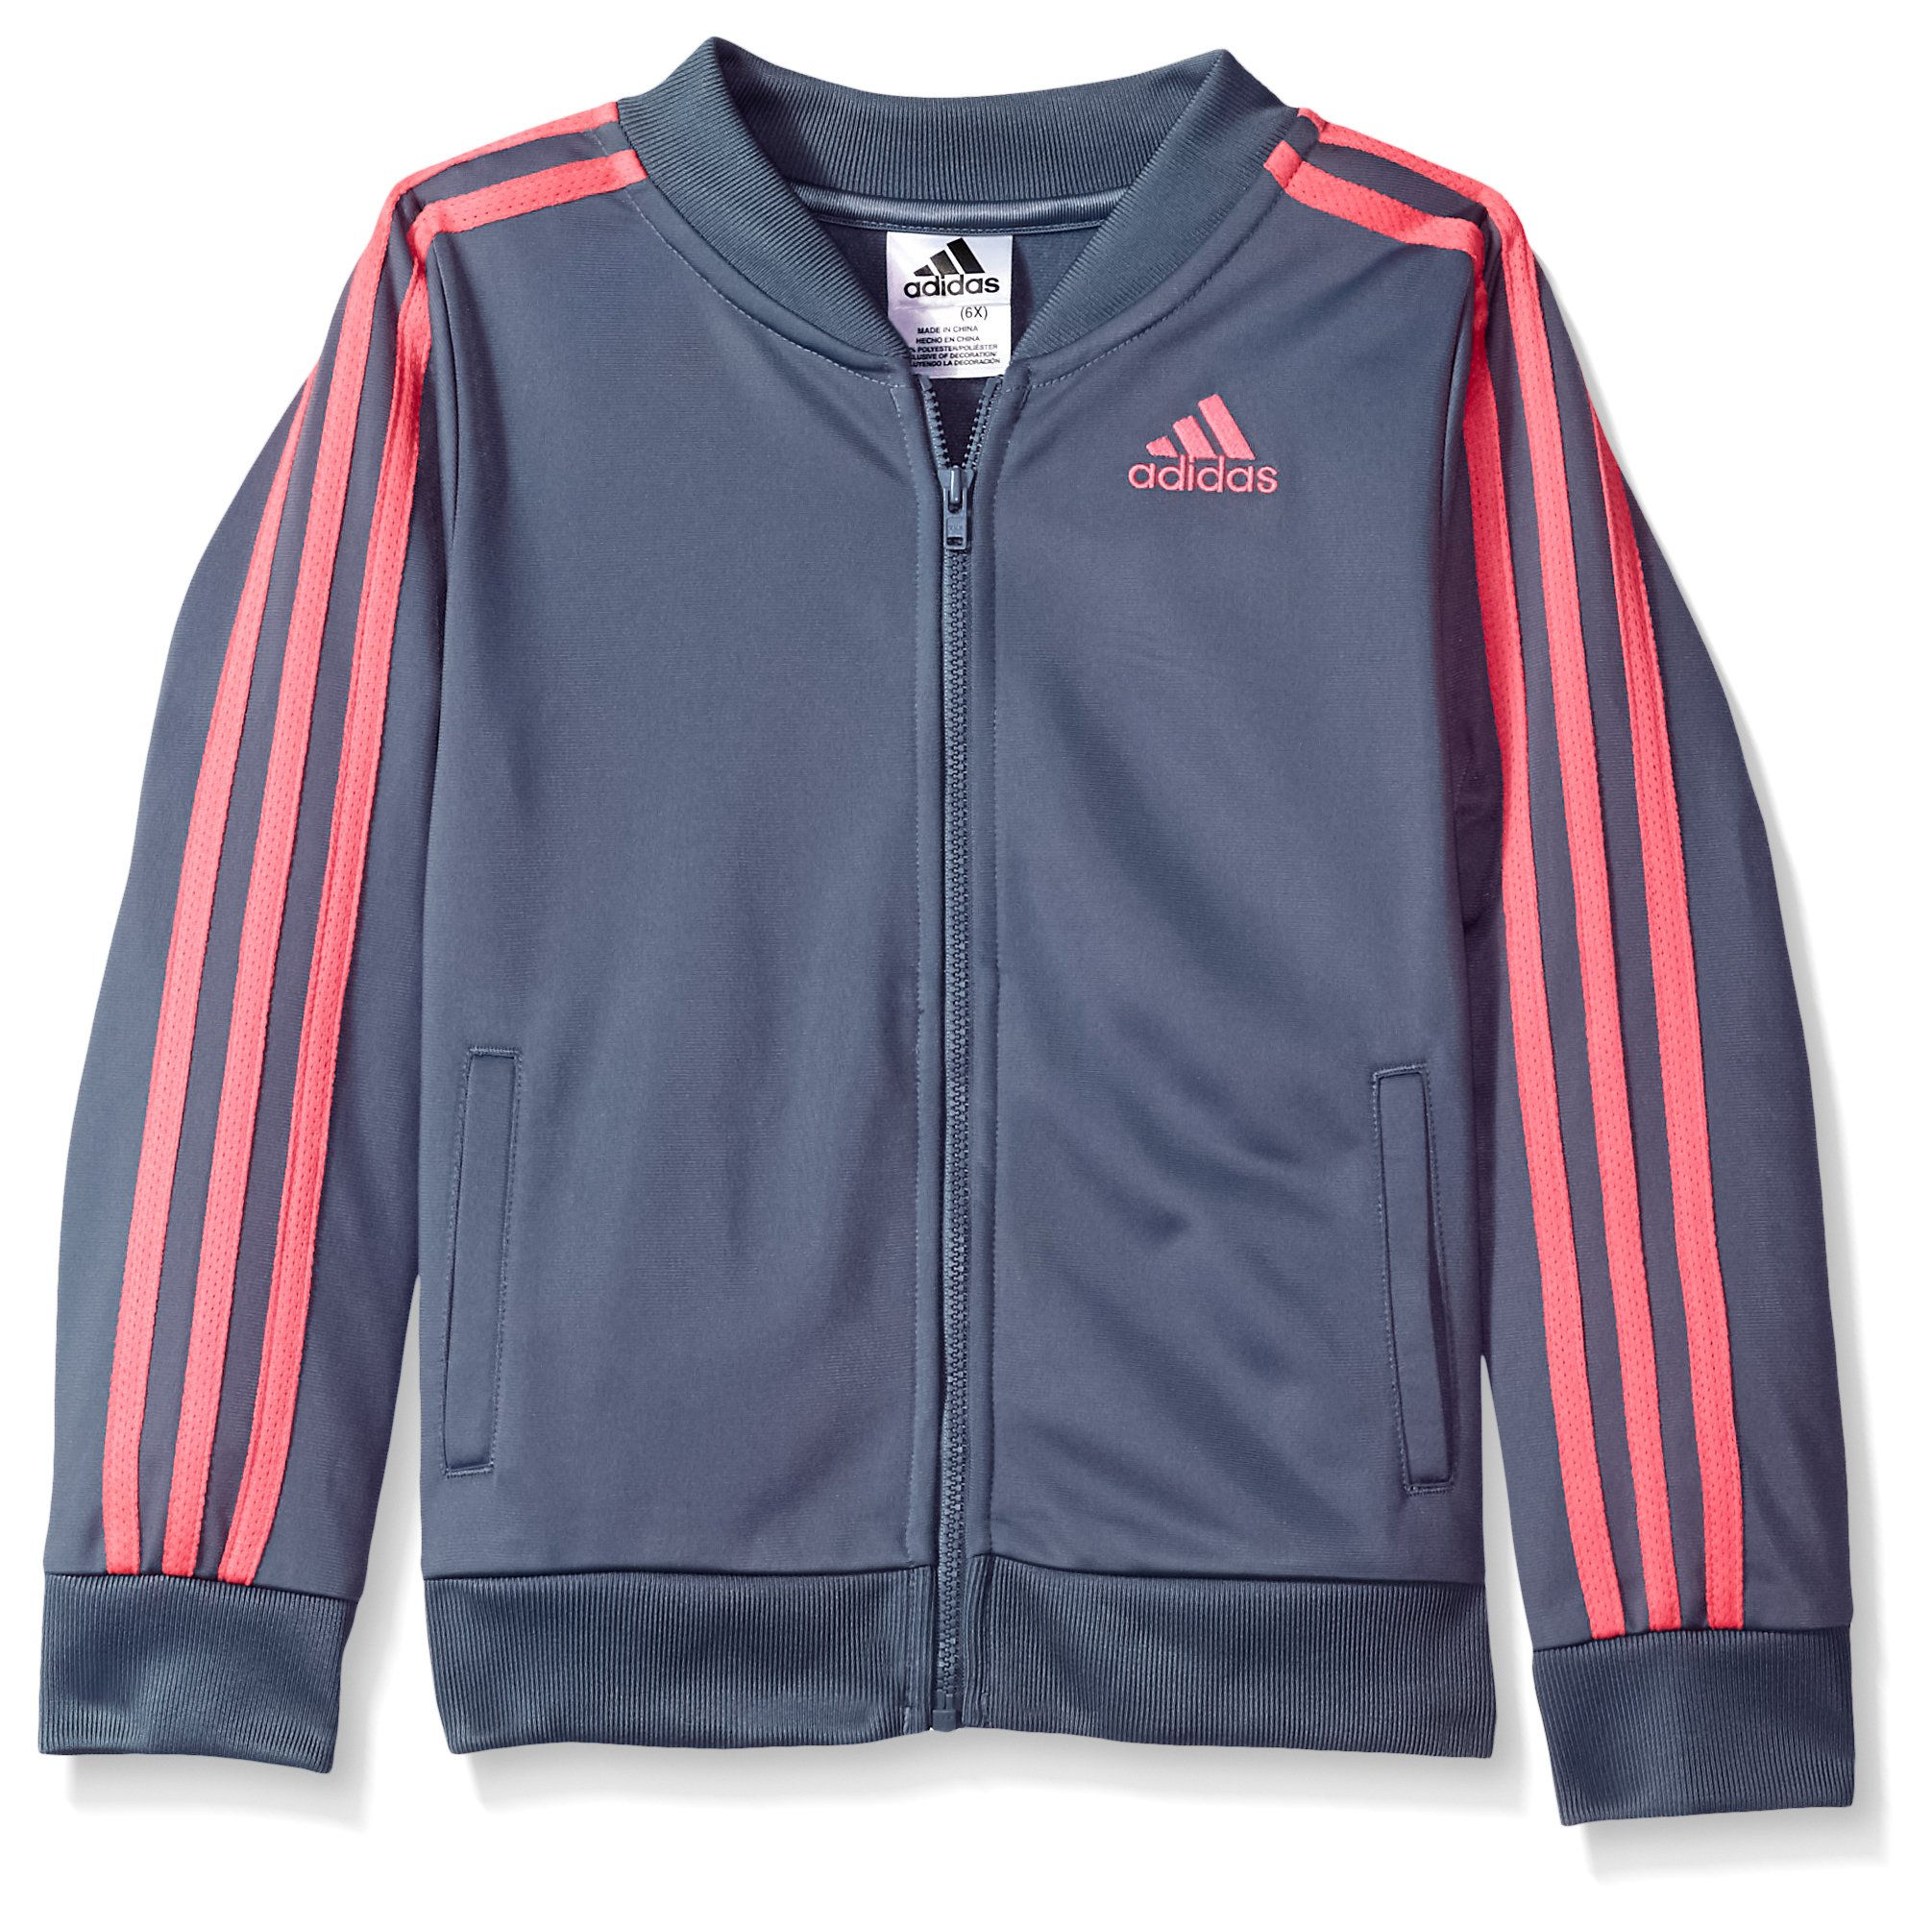 adidas Girls' Big Tricot Bomber Track Jacket, Raw Steel Adi, Small by adidas